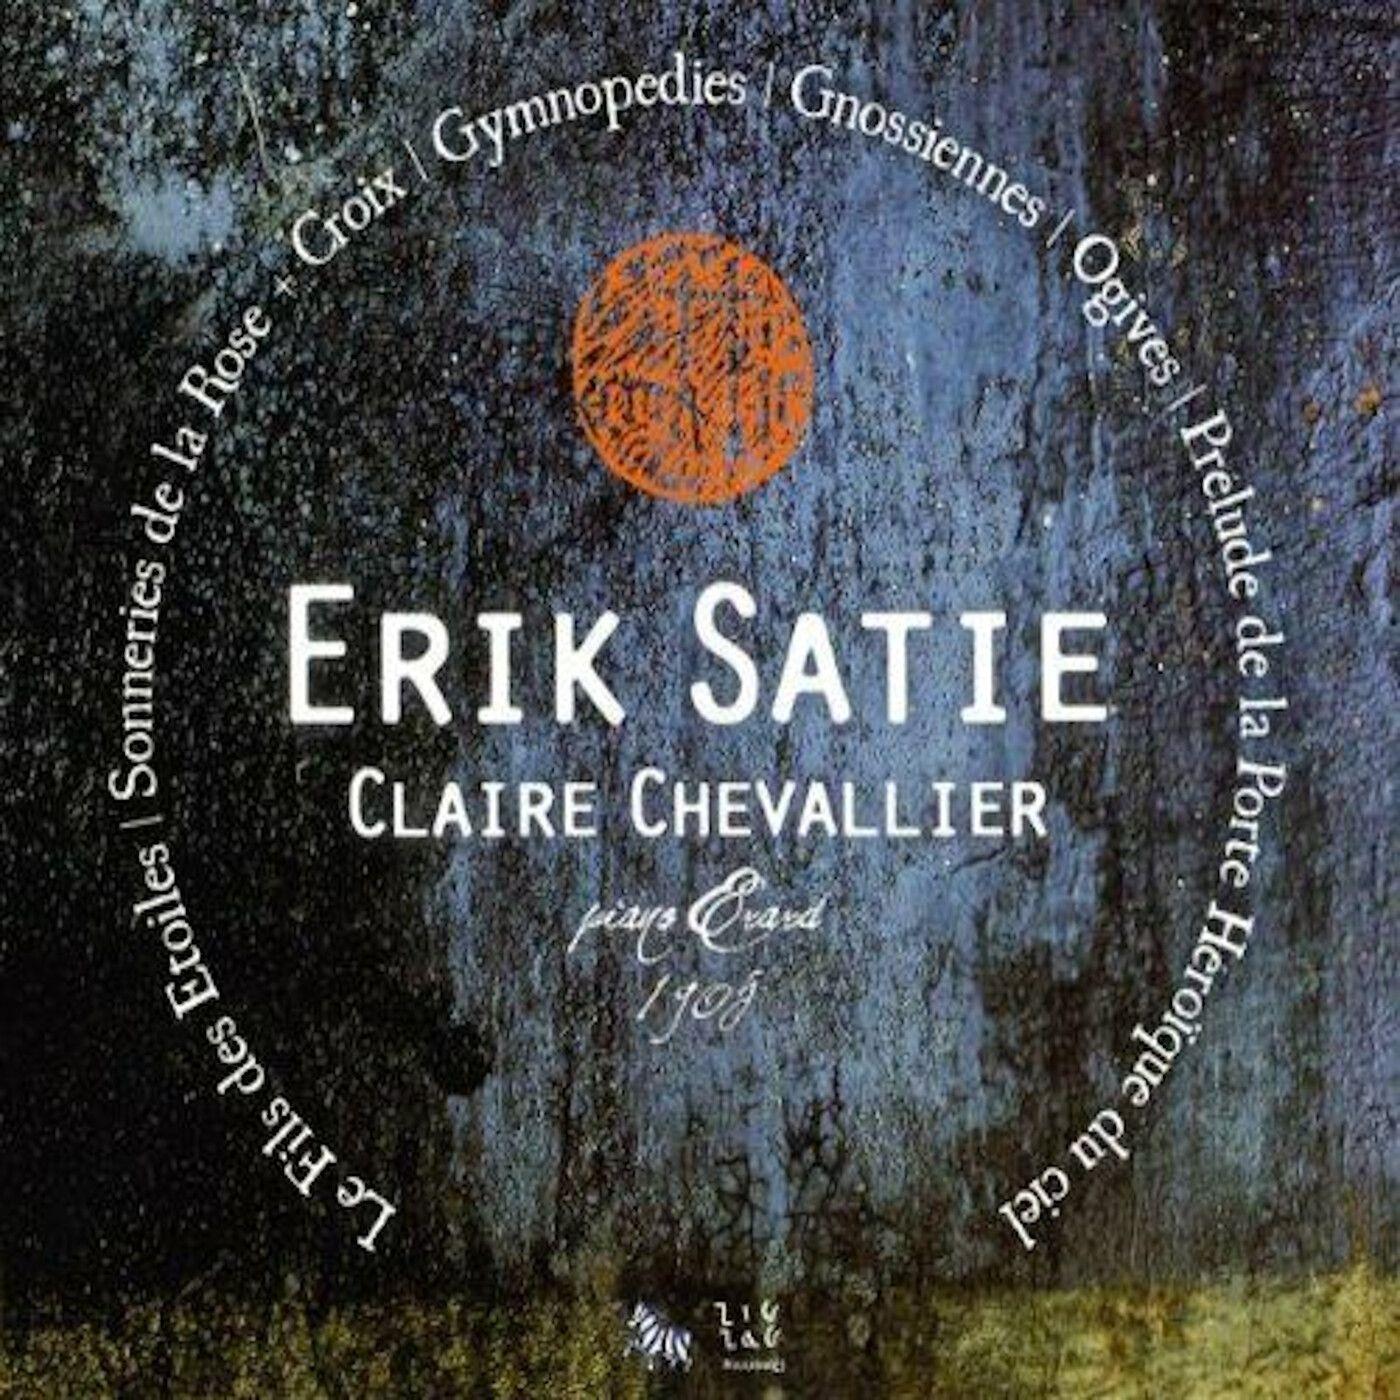 Claire Chevallier plays The Music of Erik Satie